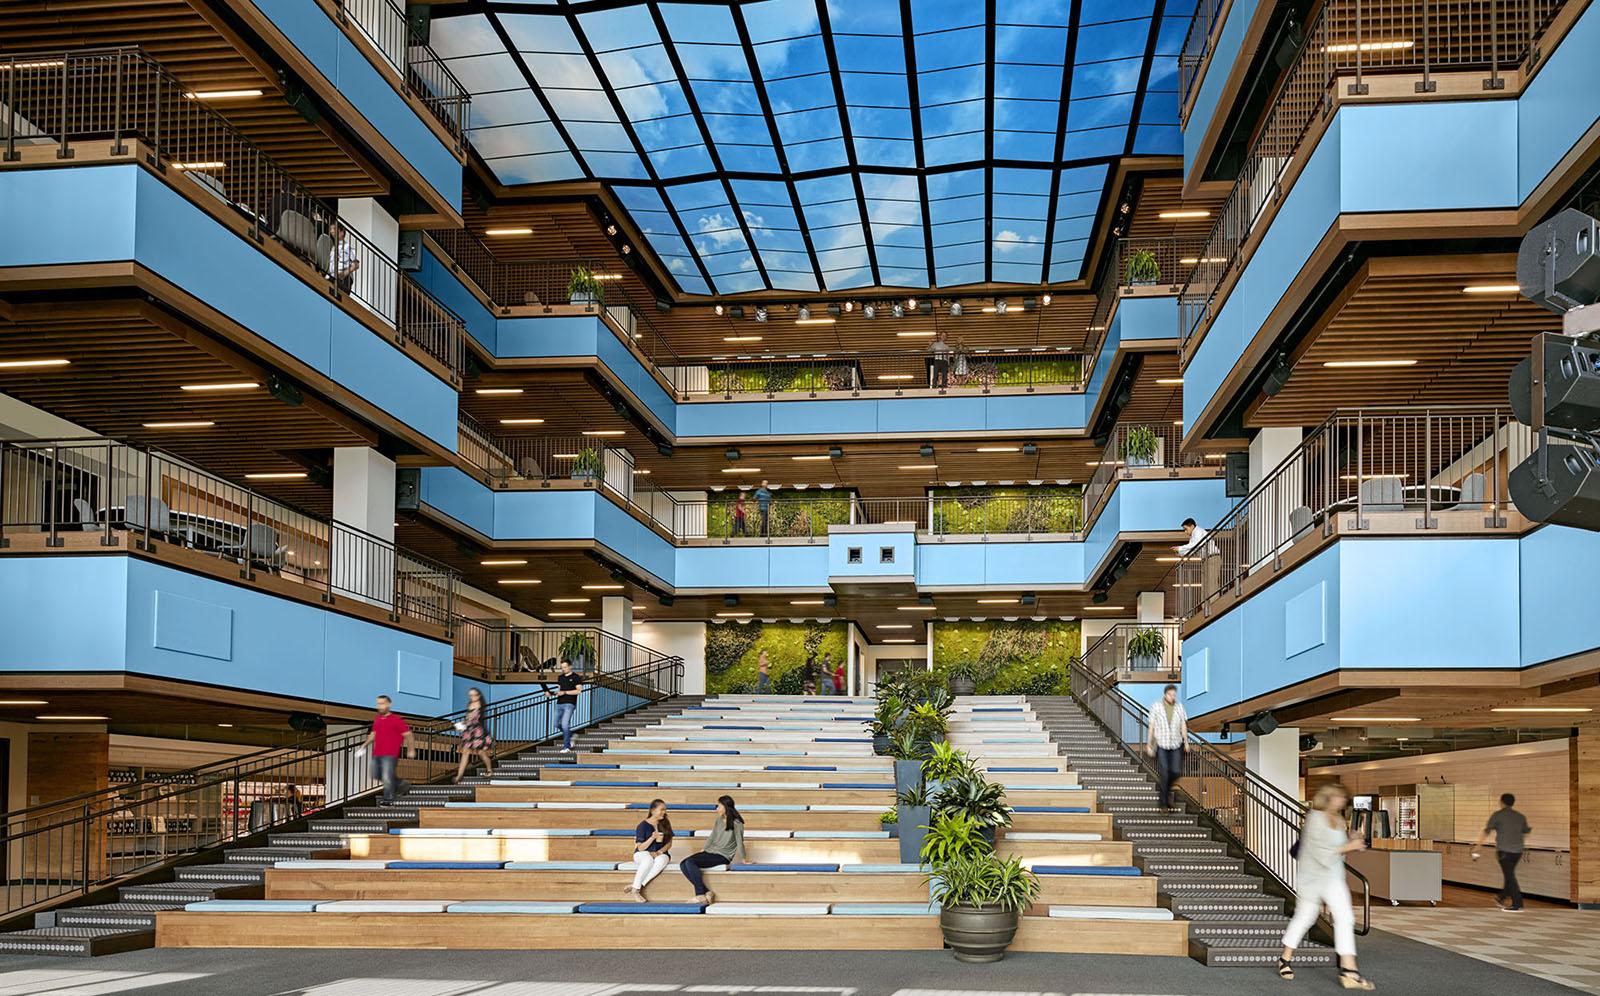 A Tour of TripAdvisor's New Beautiful Headquarters